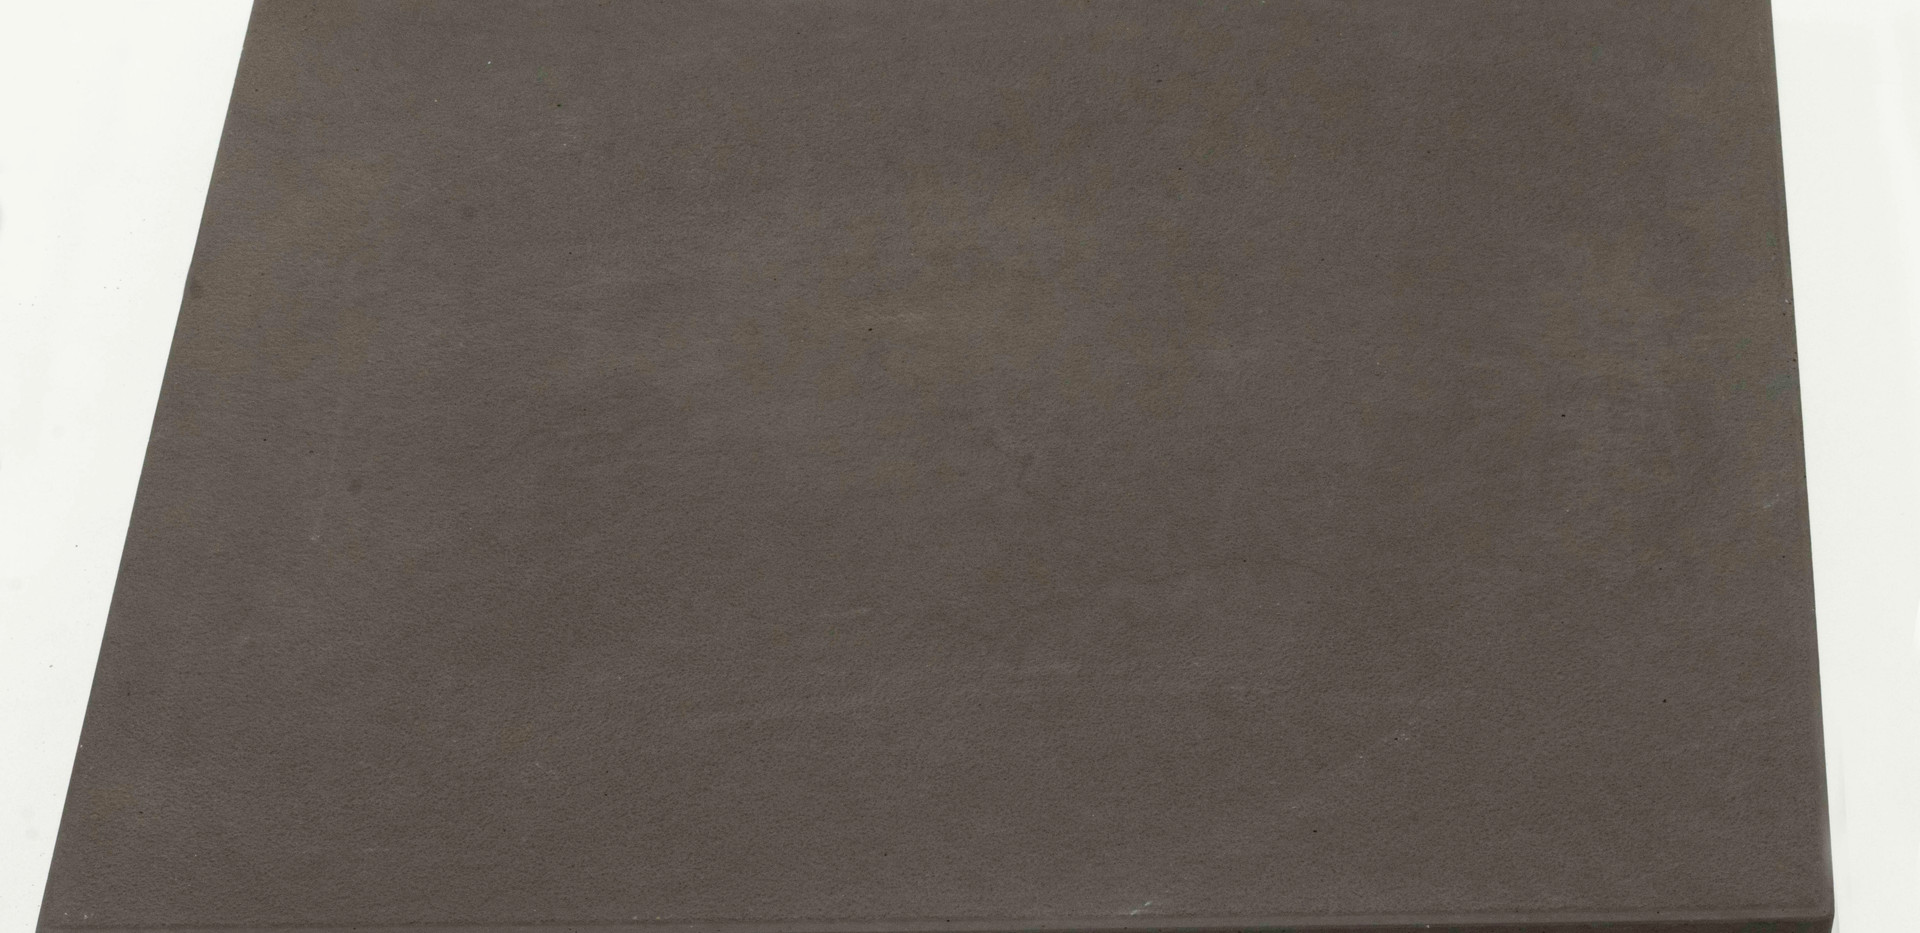 Charcoal Paver Concrete.jpg